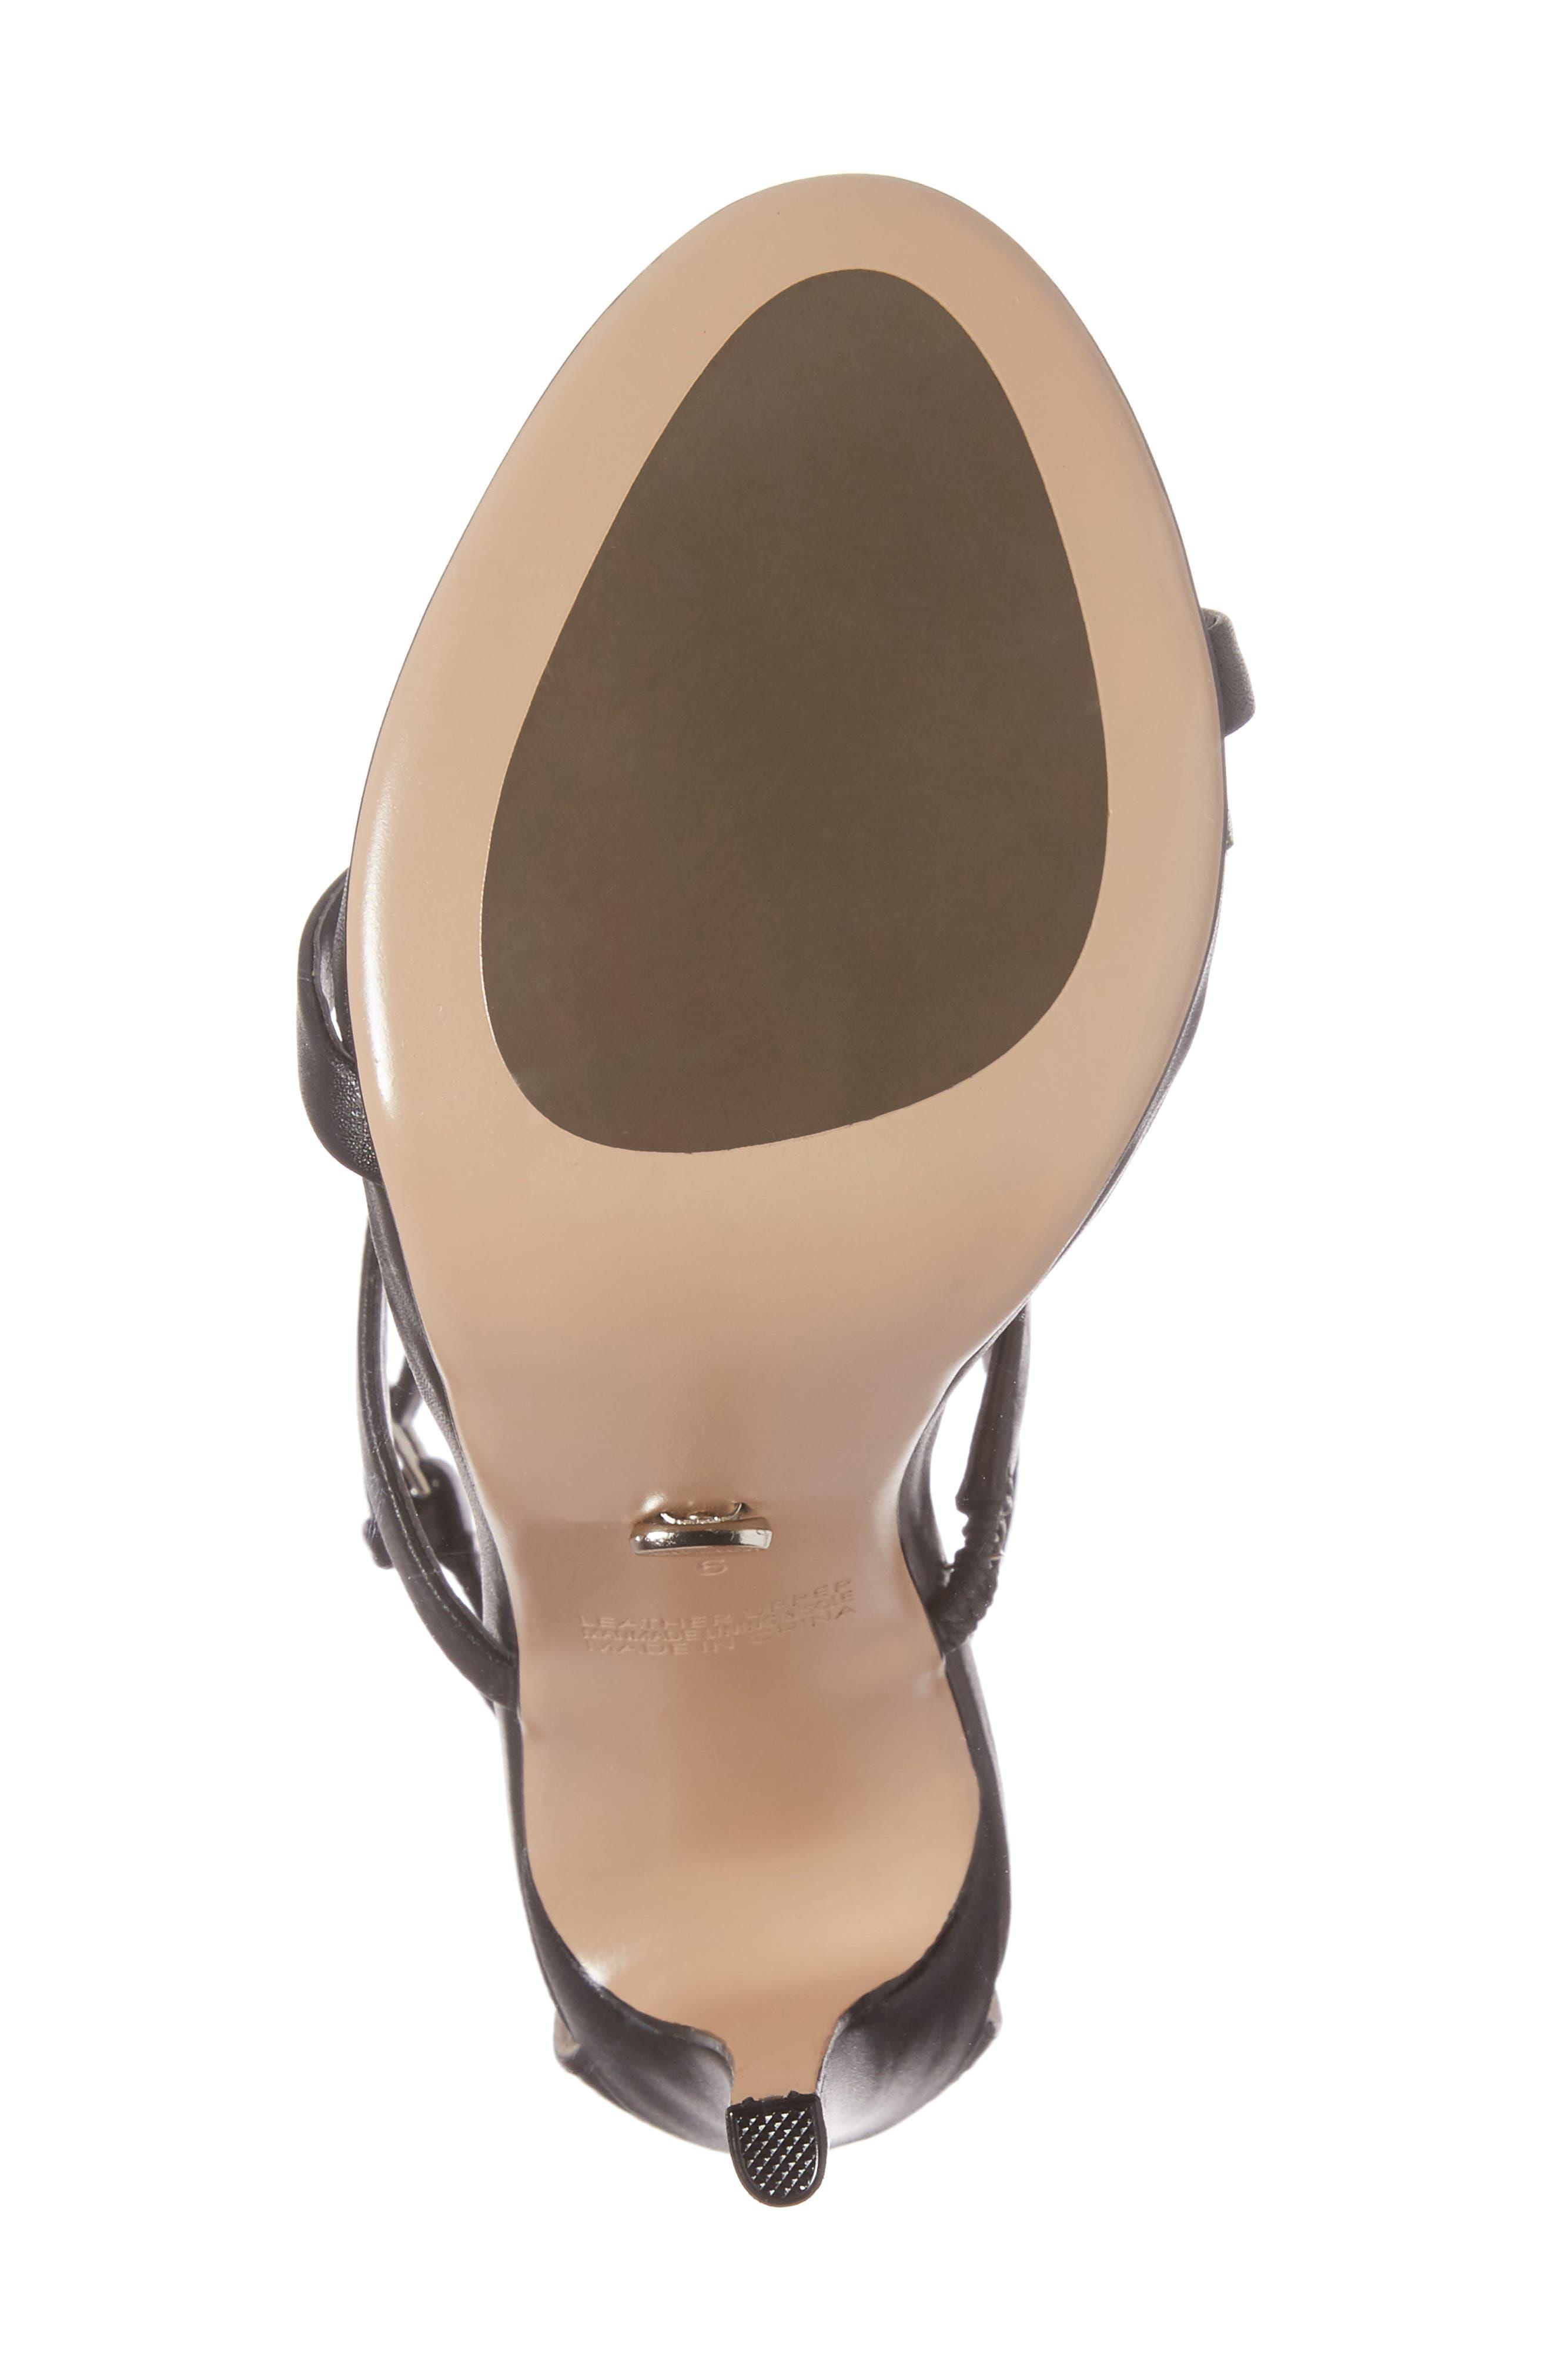 Atkins Sandal,                             Alternate thumbnail 6, color,                             Black Capretto Leather